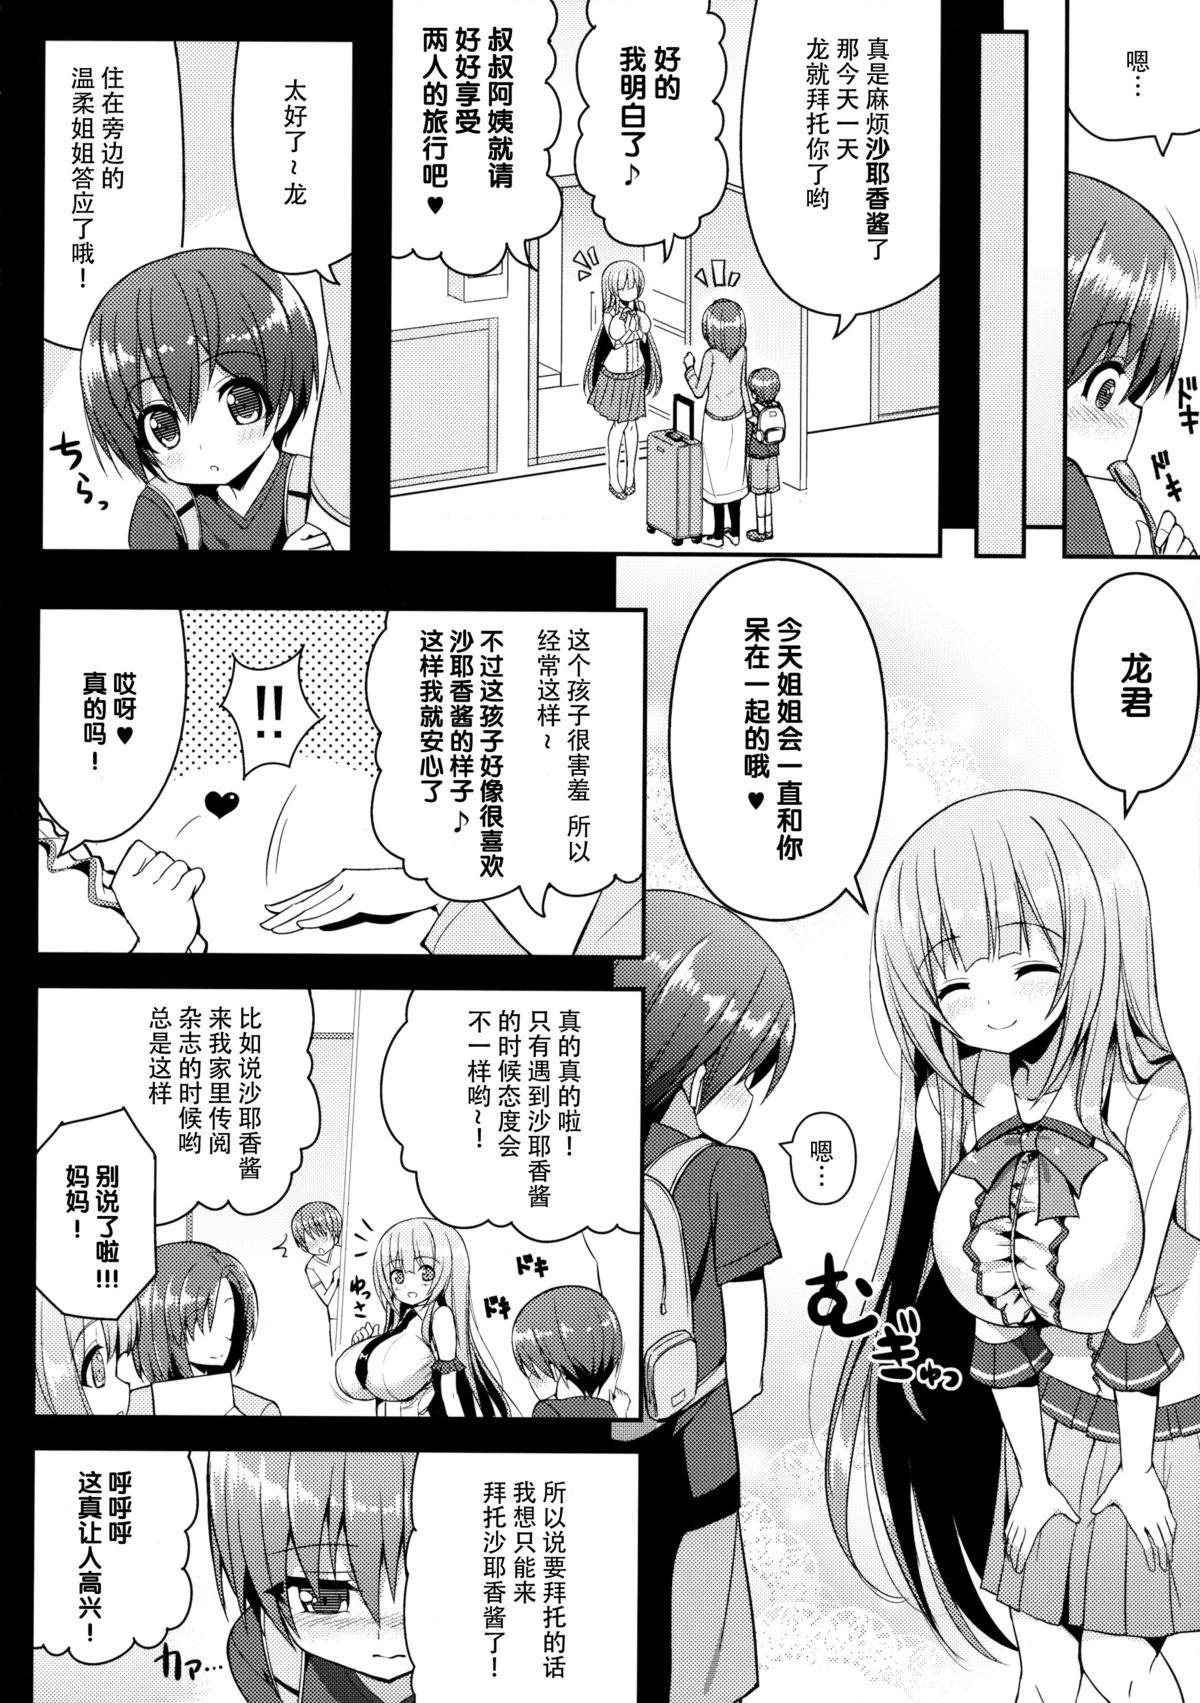 Onee-san no Heya ni Hitobandake 5